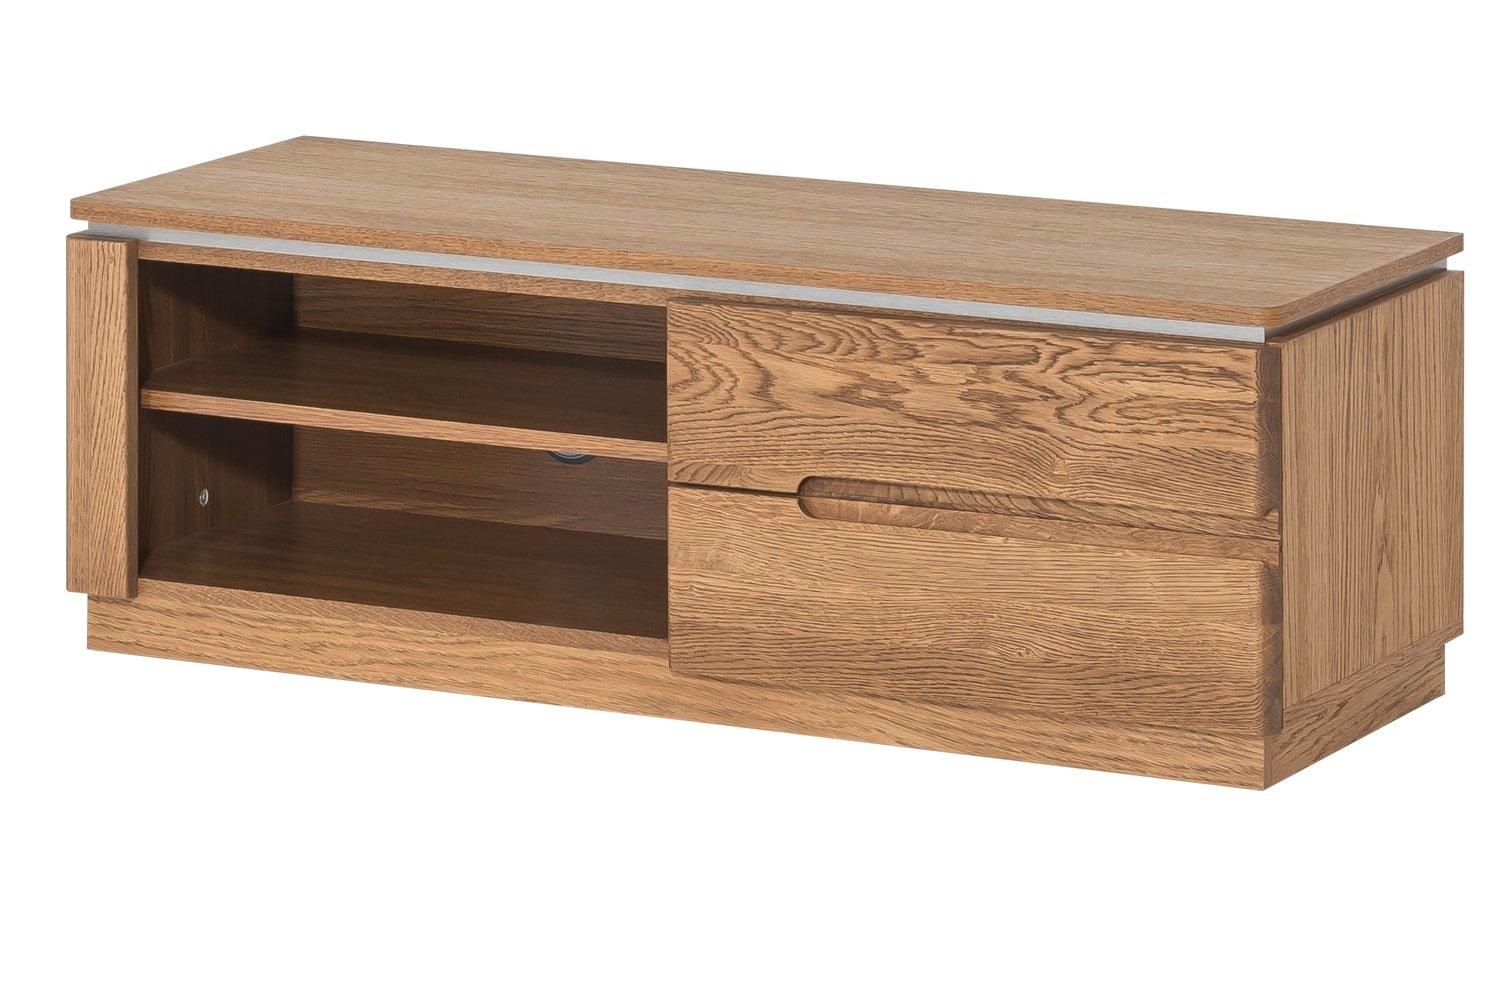 Comoda TV din lemn si furnir, cu 1 usa Montenegro 24 Small Stejar Rustic, l108xA42xH38 cm imagine